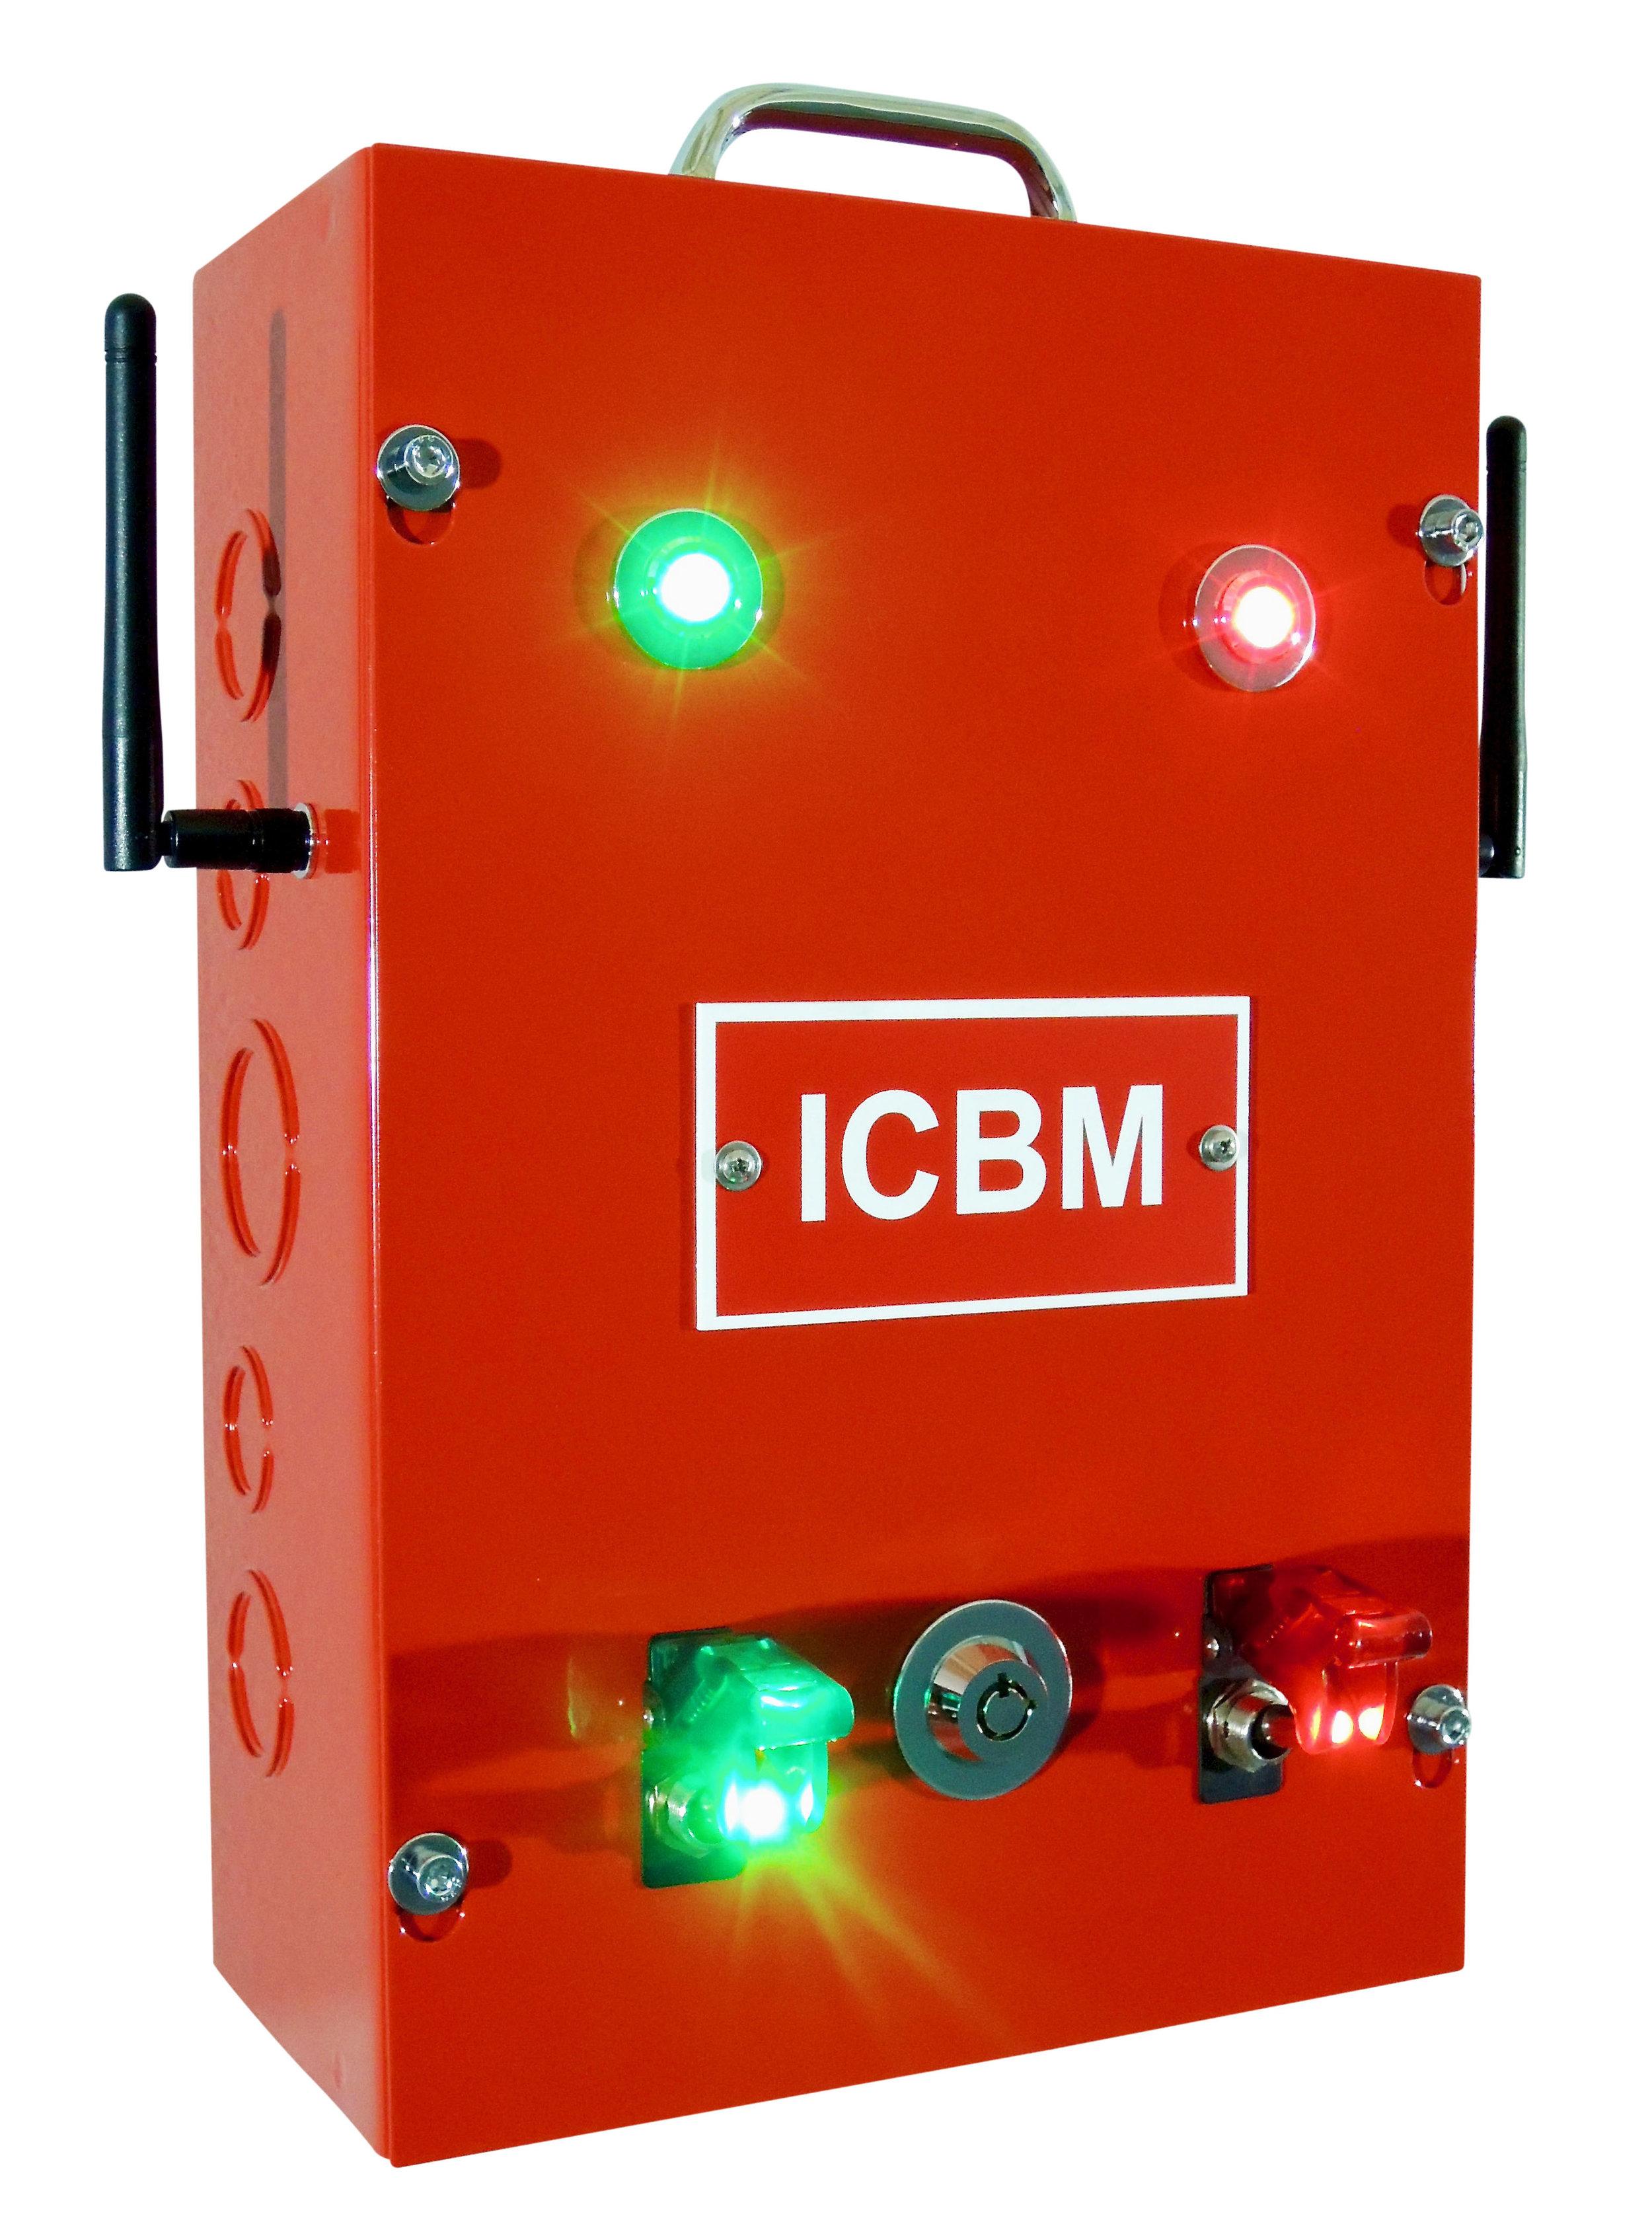 icbm%2A (1).jpg